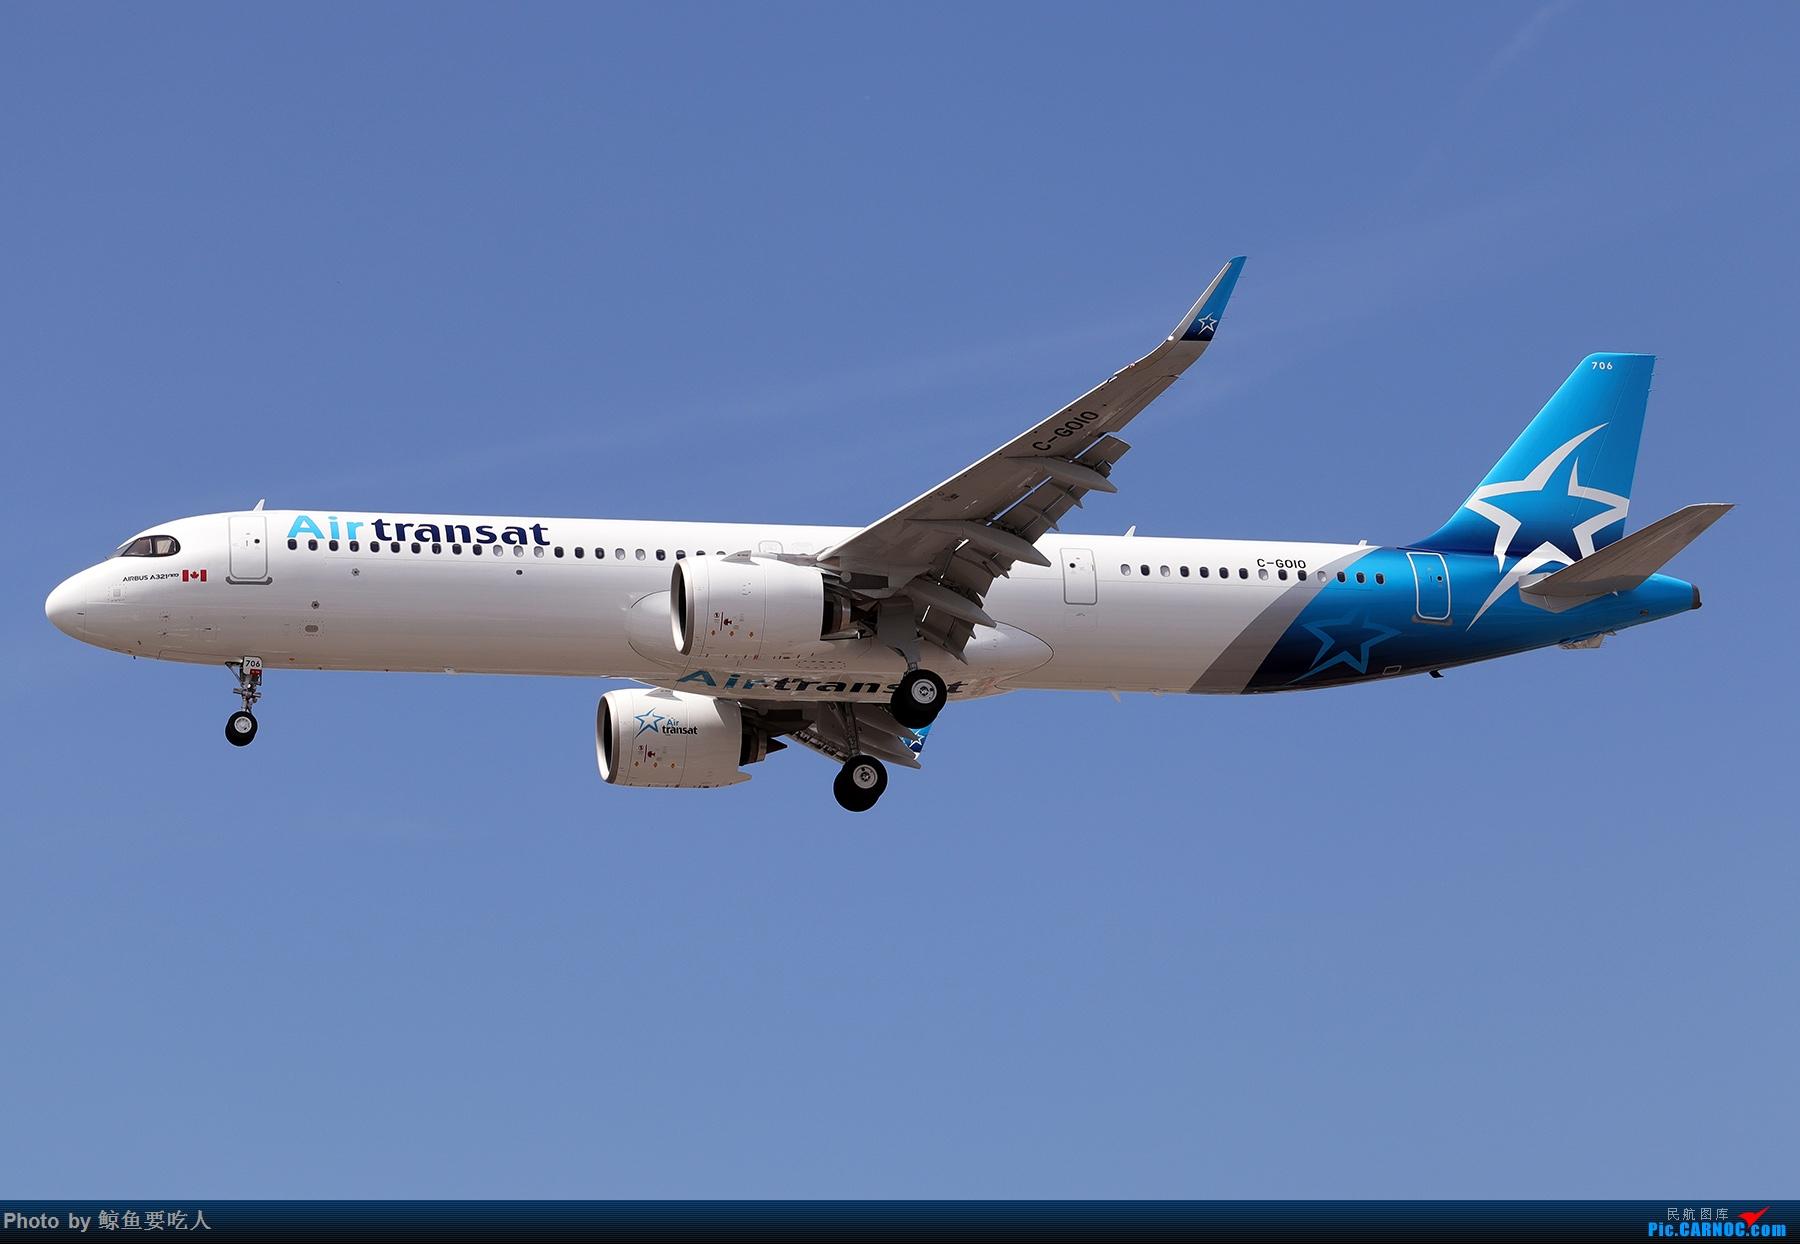 Re:[原创]【多图党】见证疫情后逐步的恢复,加拿大夏日多伦多皮尔逊机场拍机~ 乐见诸航空公司复航多伦多 AIRBUS A320NEO C-GOIO 多伦多皮尔逊国际机场